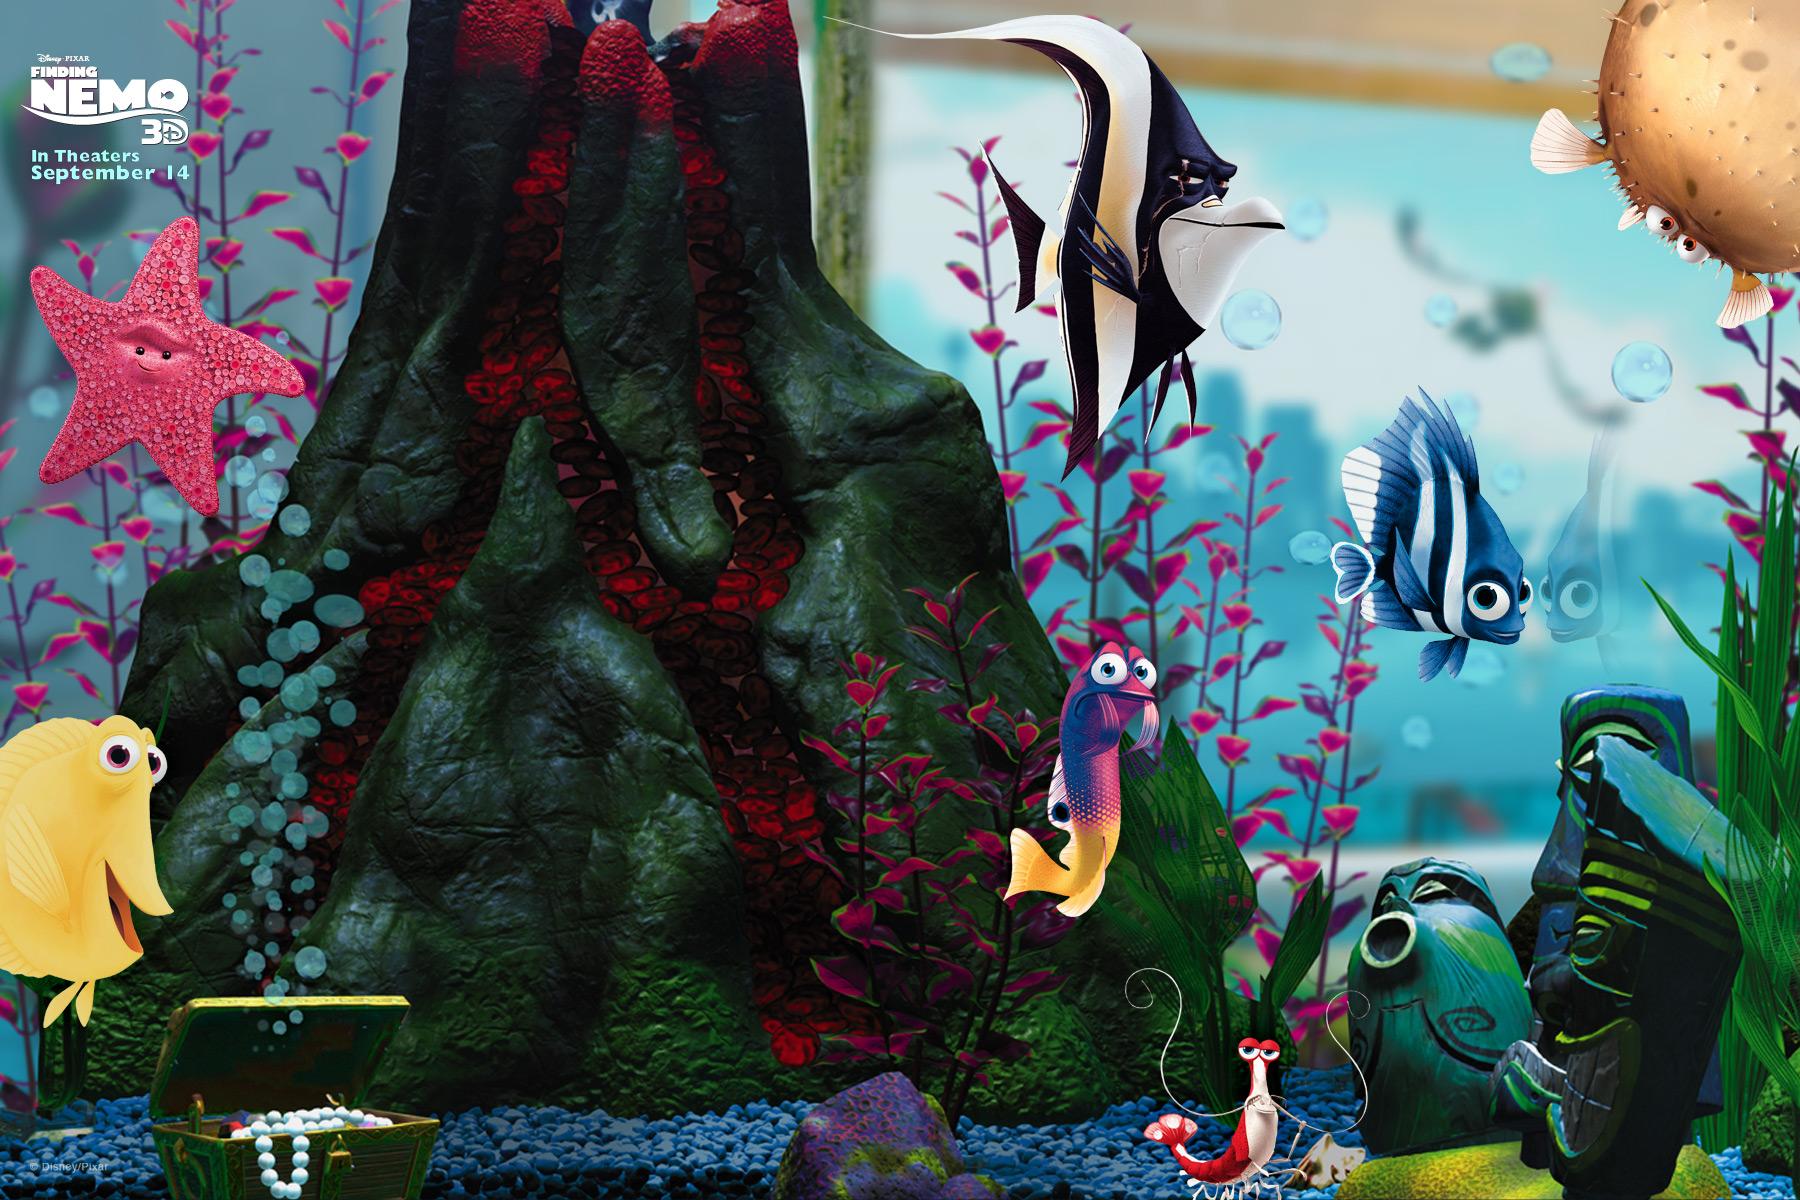 Finding Nemo D Animasi Hd Wallpaper: Disney 3D Wallpaper